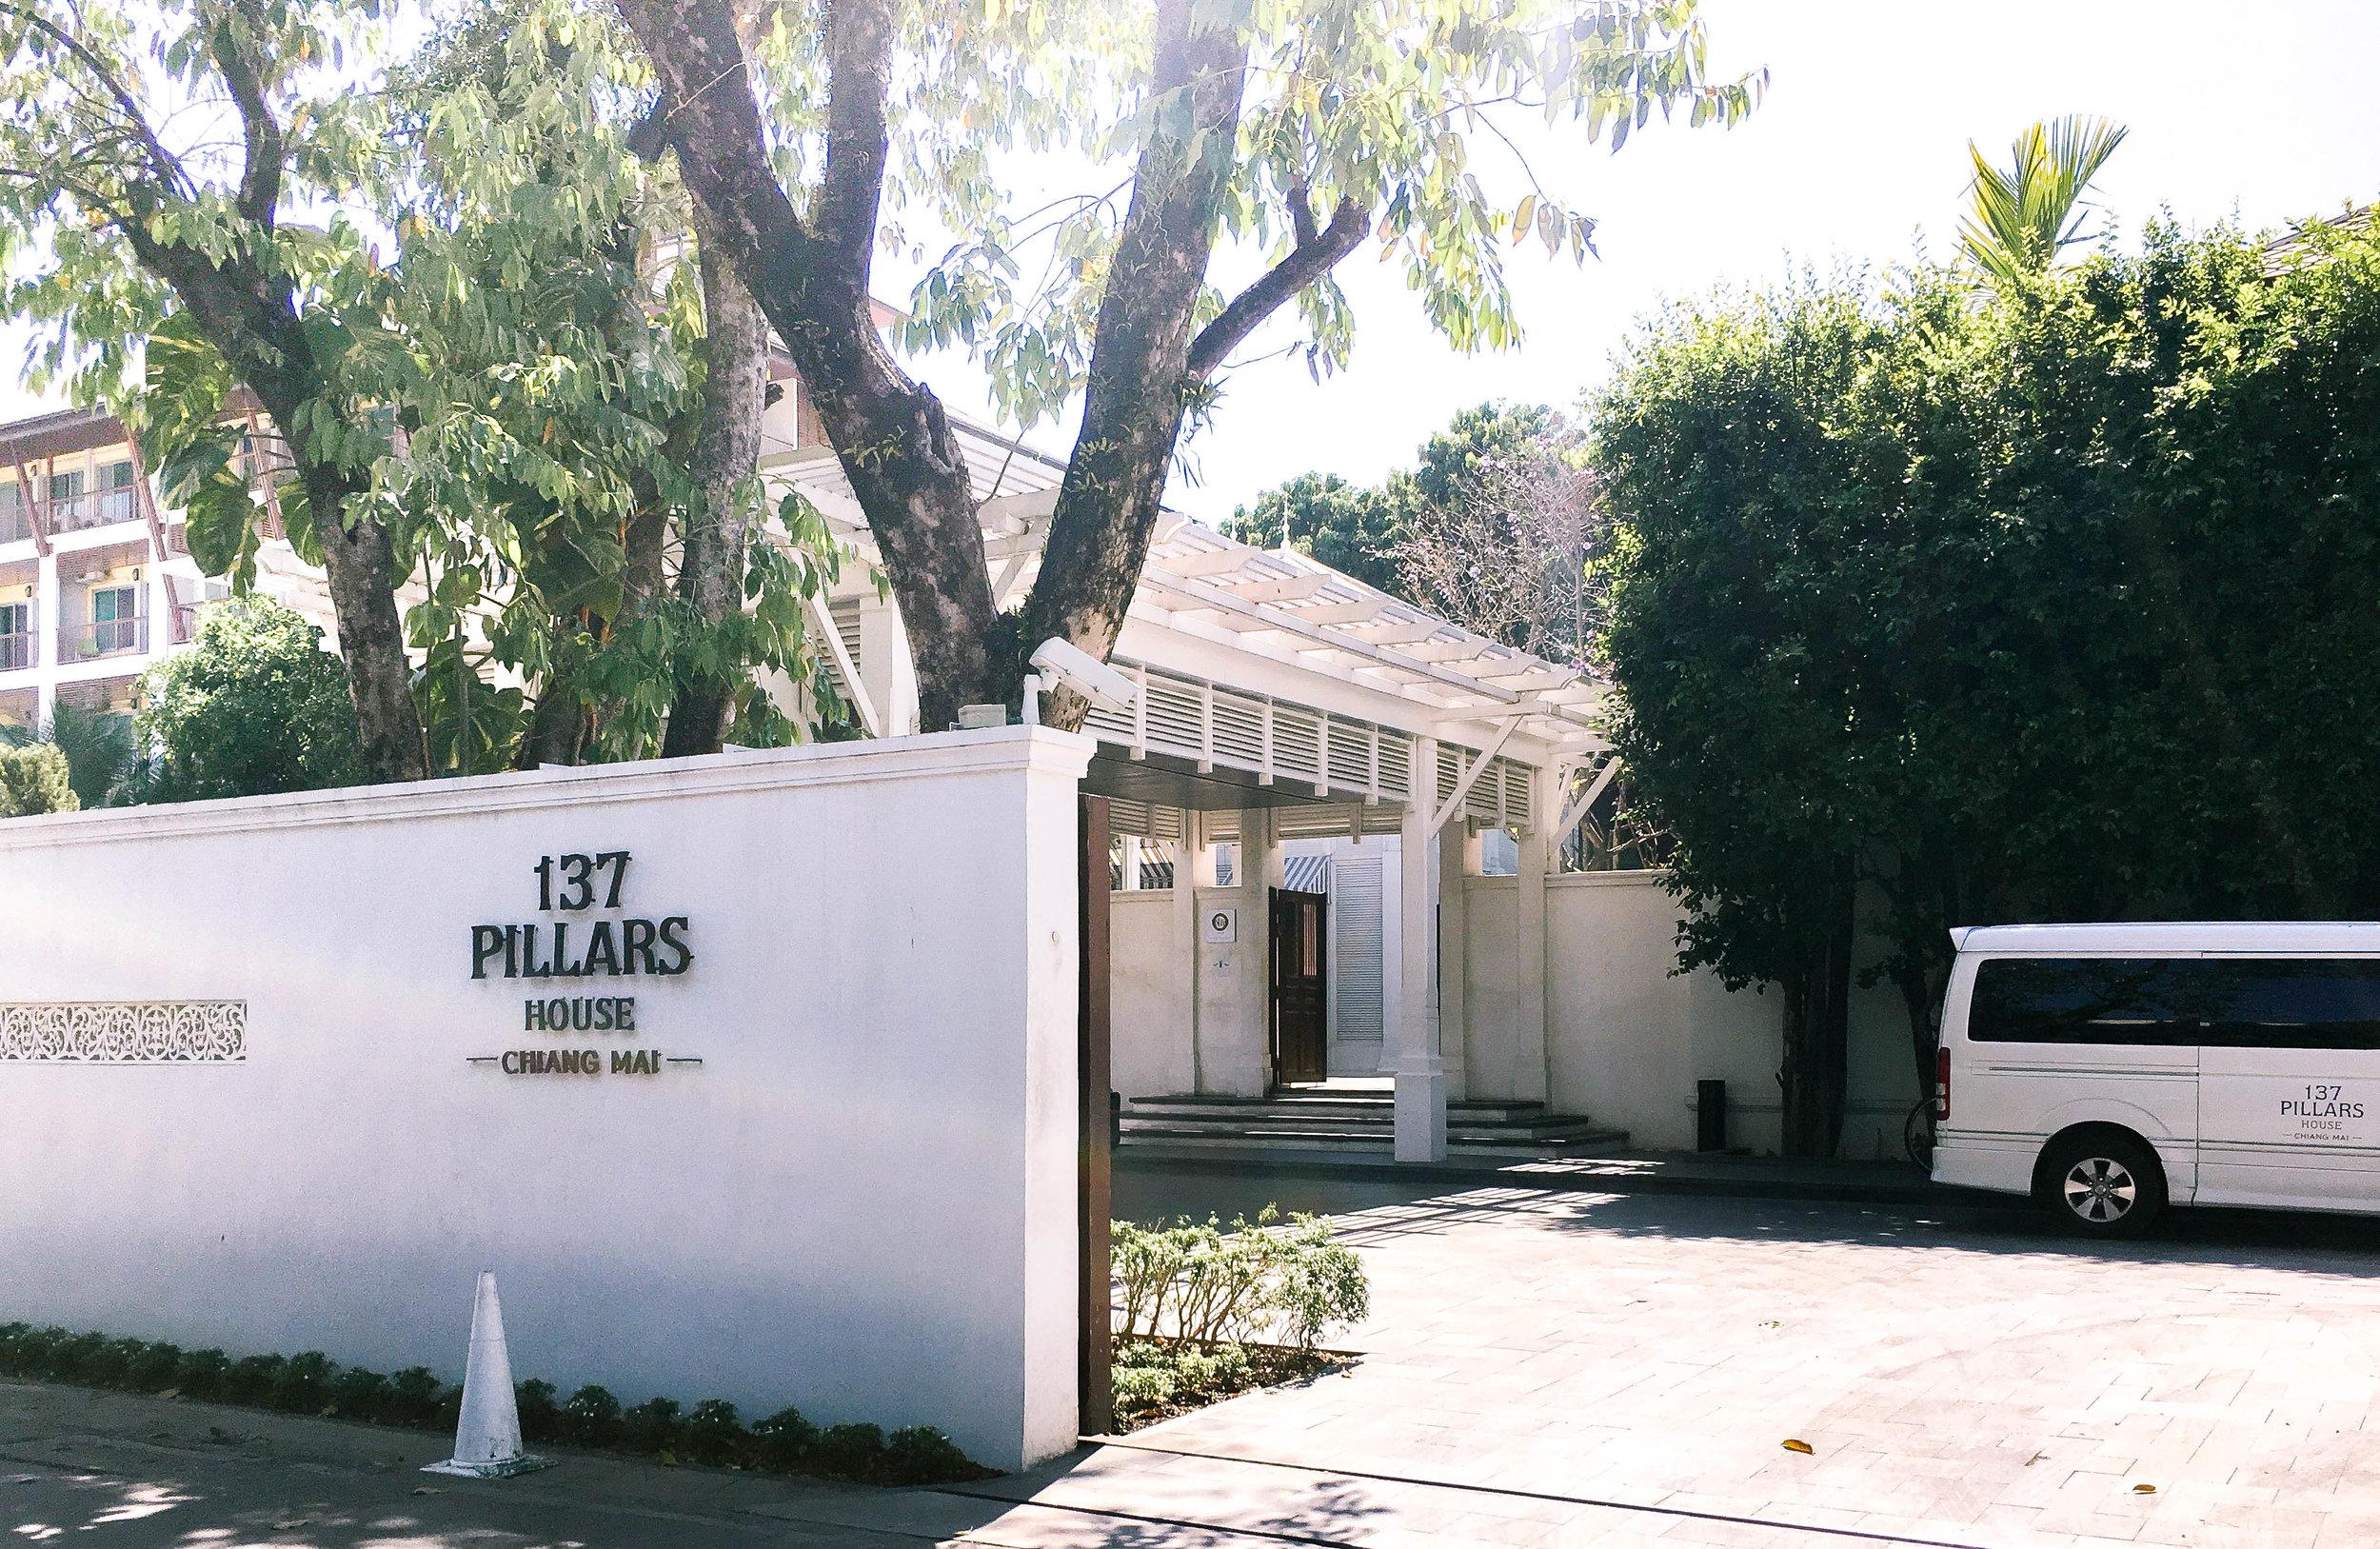 137 Pillars Entrance